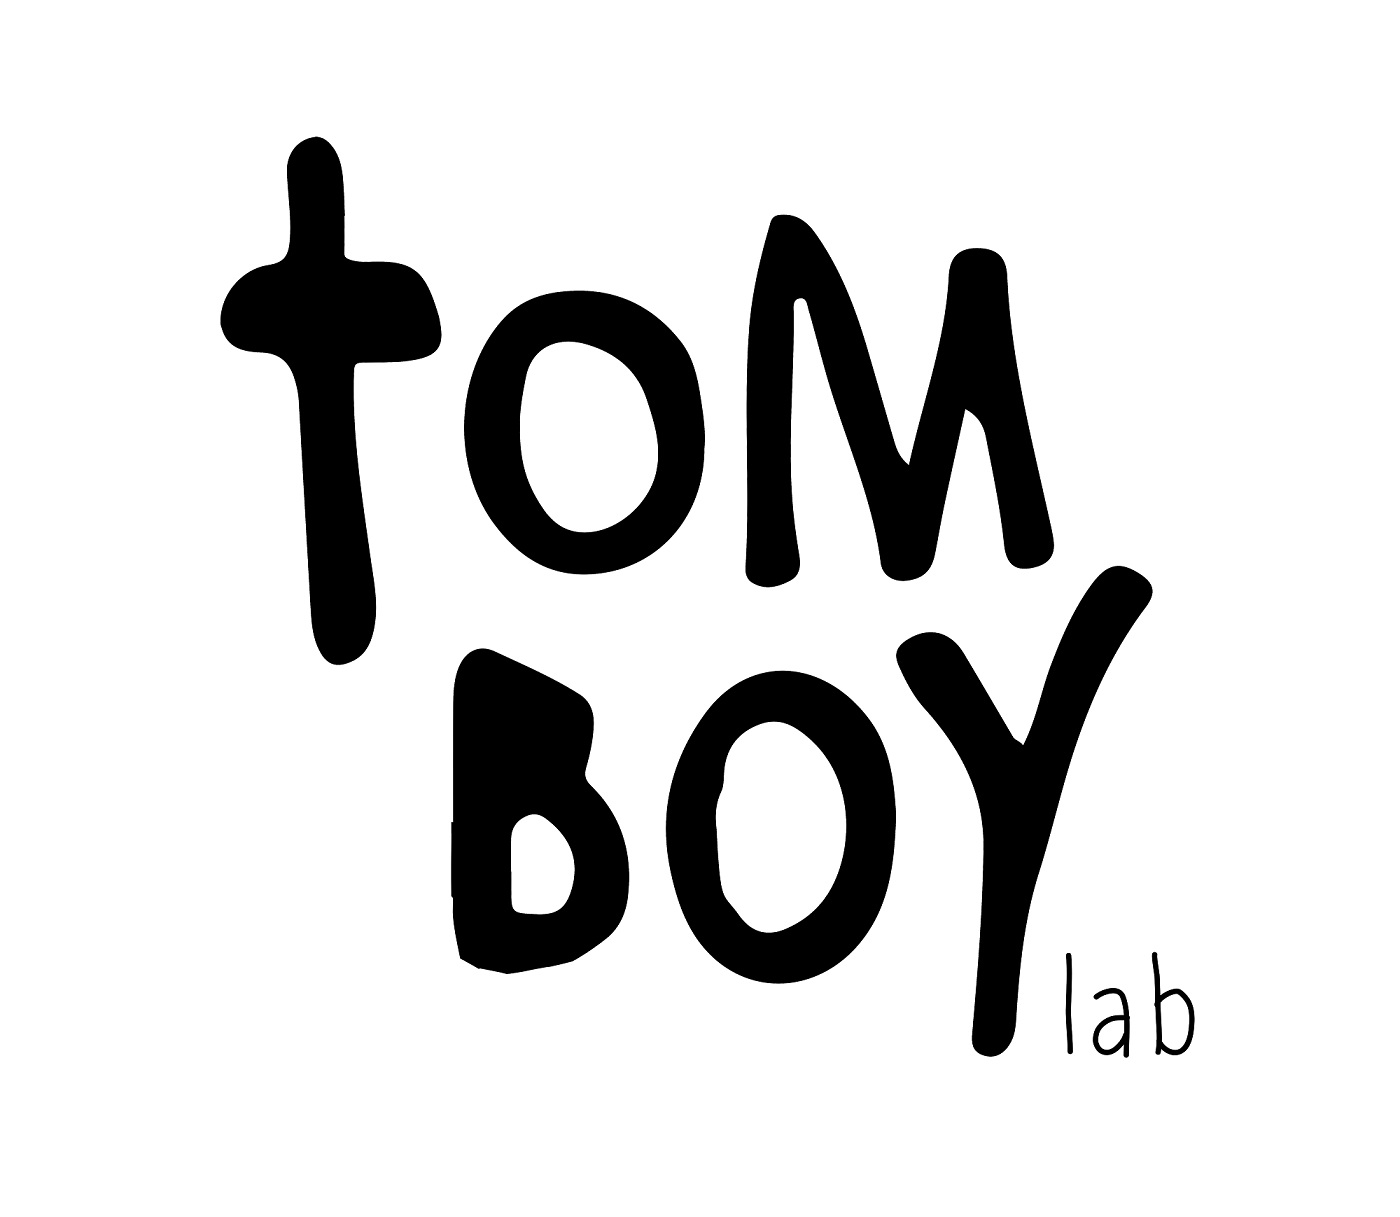 tomboy lab2.jpg